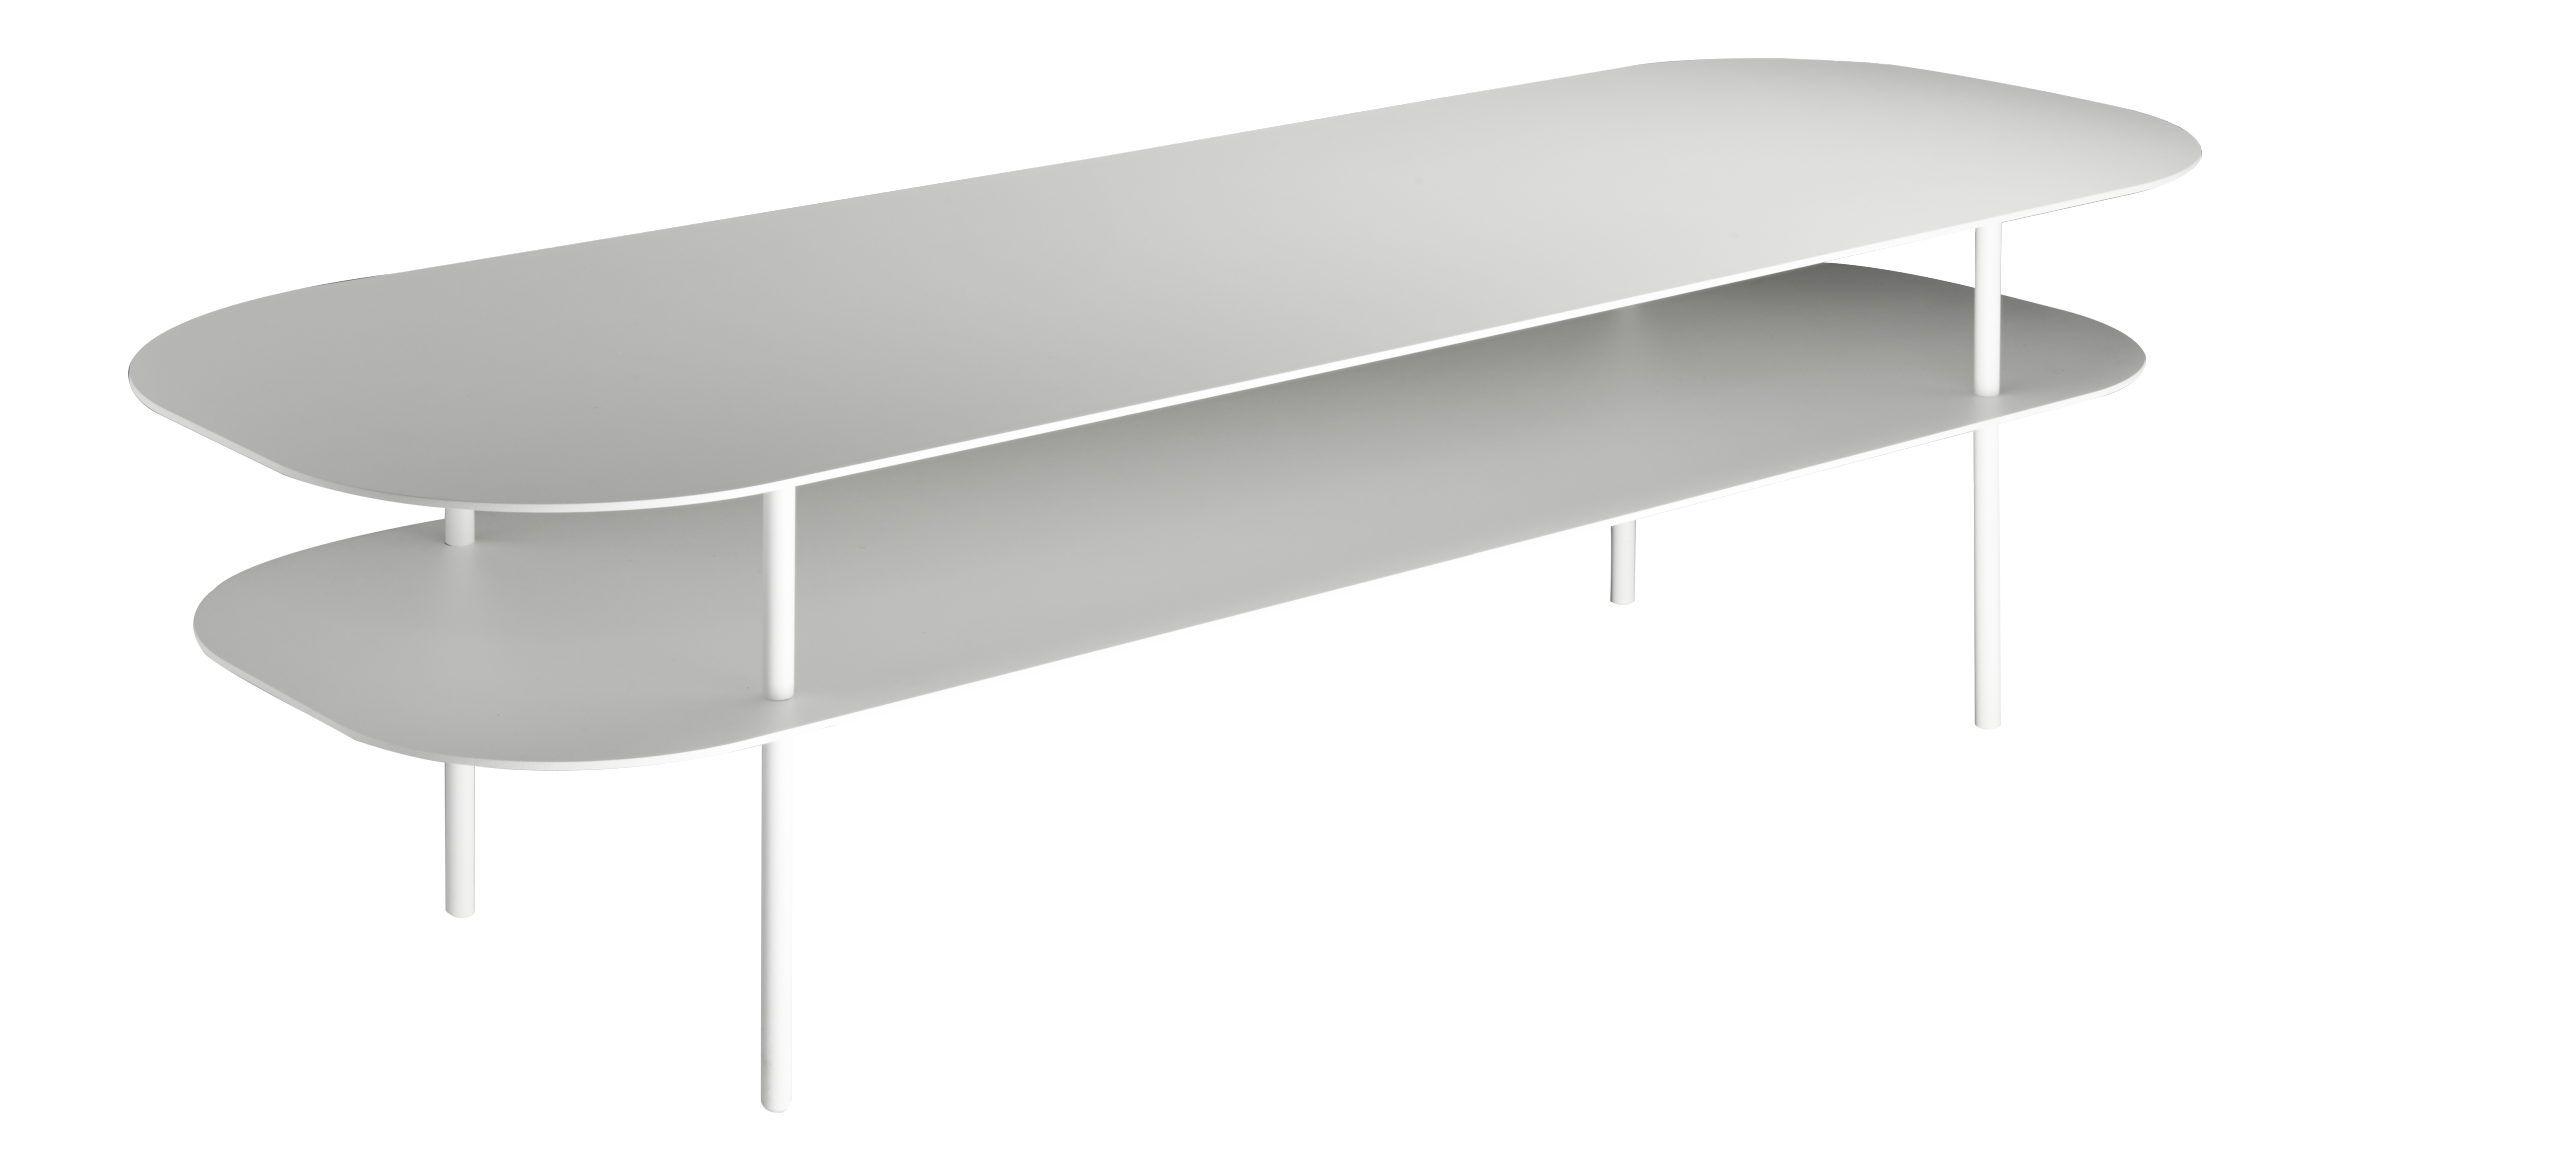 COLINE white Metal coffee table | habitat.fr | Meubles - Furnitures ...